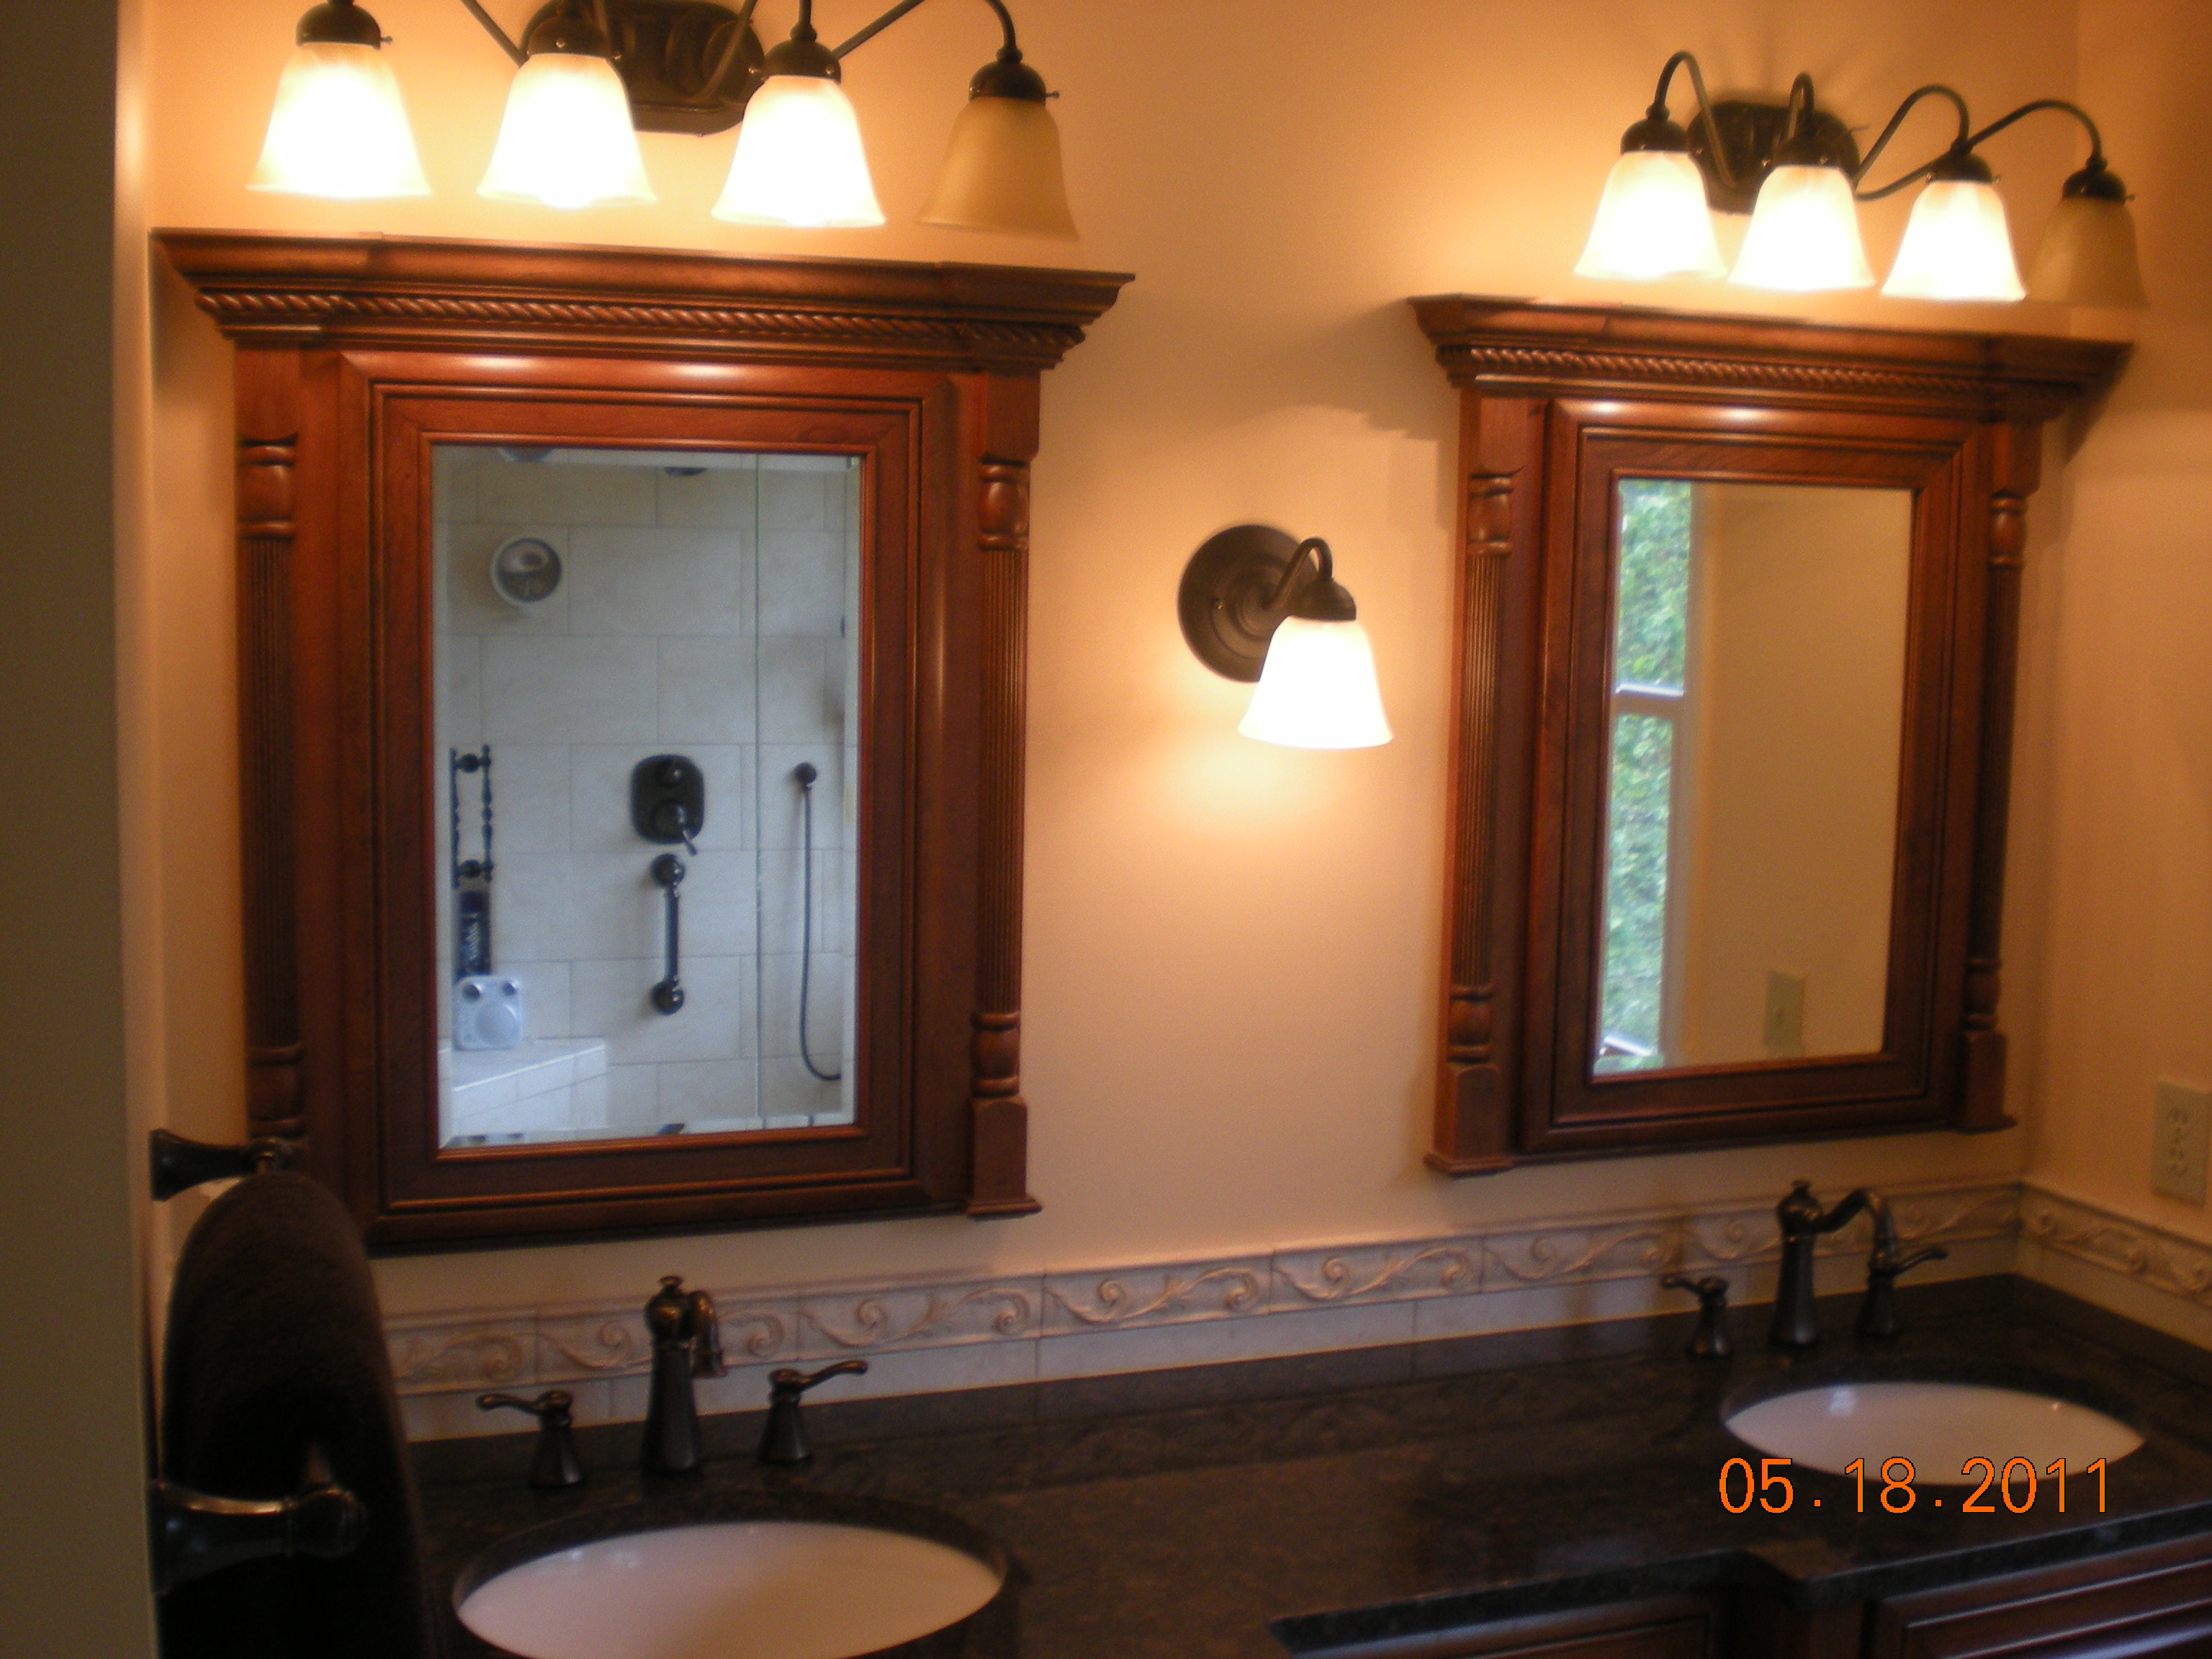 Baths « Combs Builders, Inc.